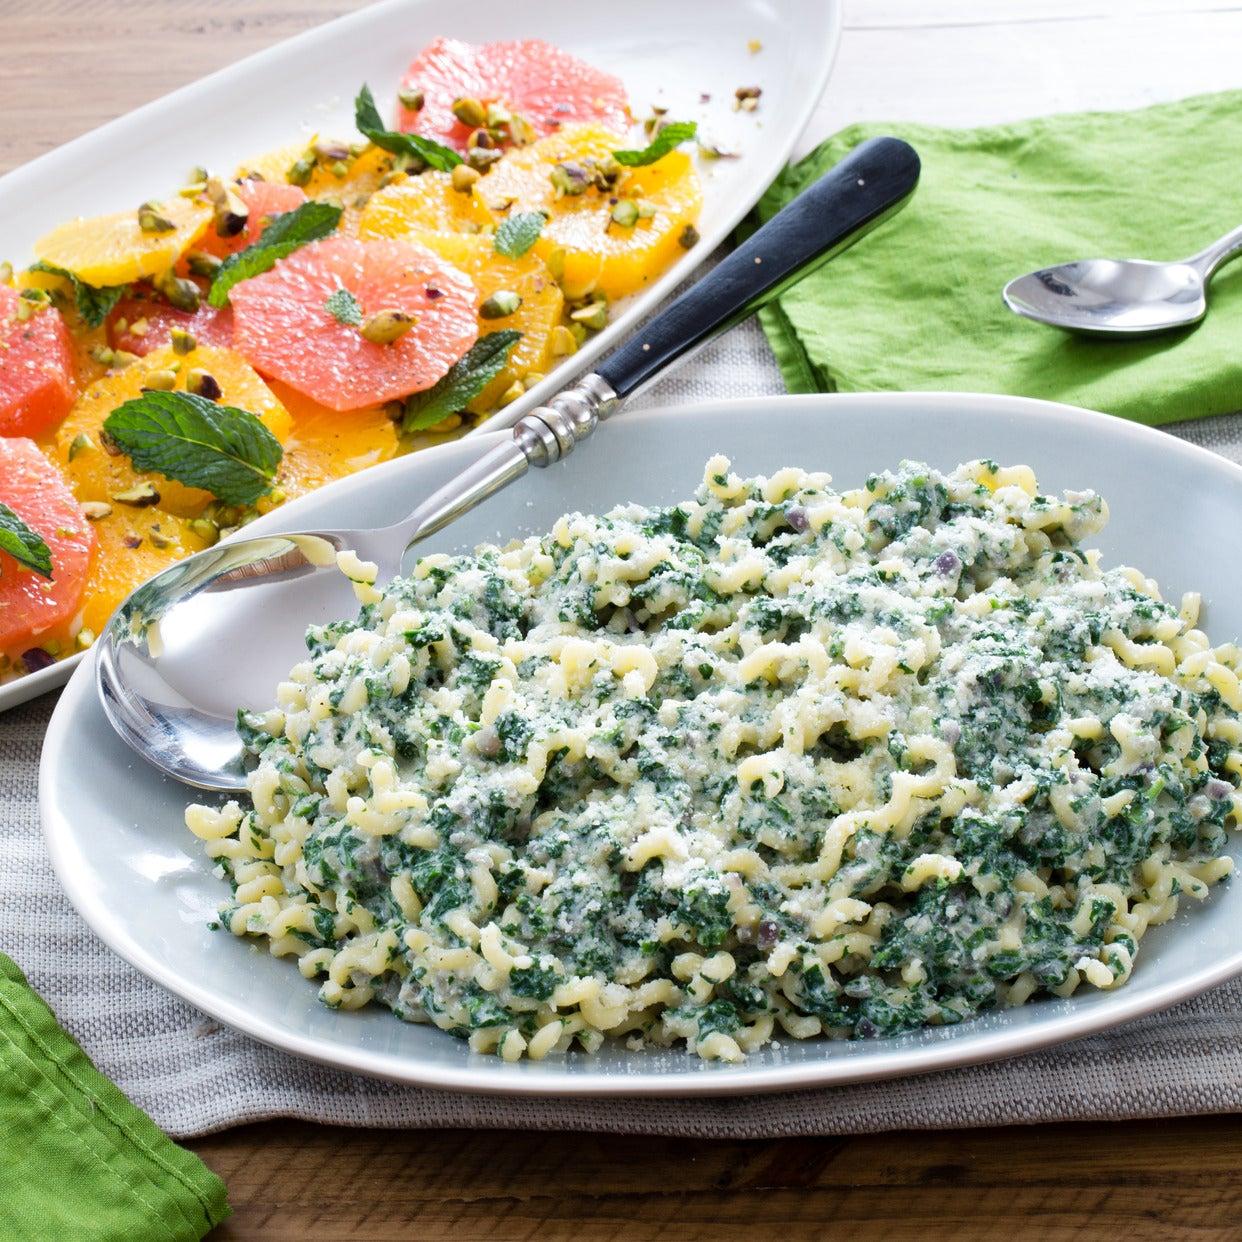 Ricotta & Spinach Pasta with Orange, Hazelnut & Mint Salad